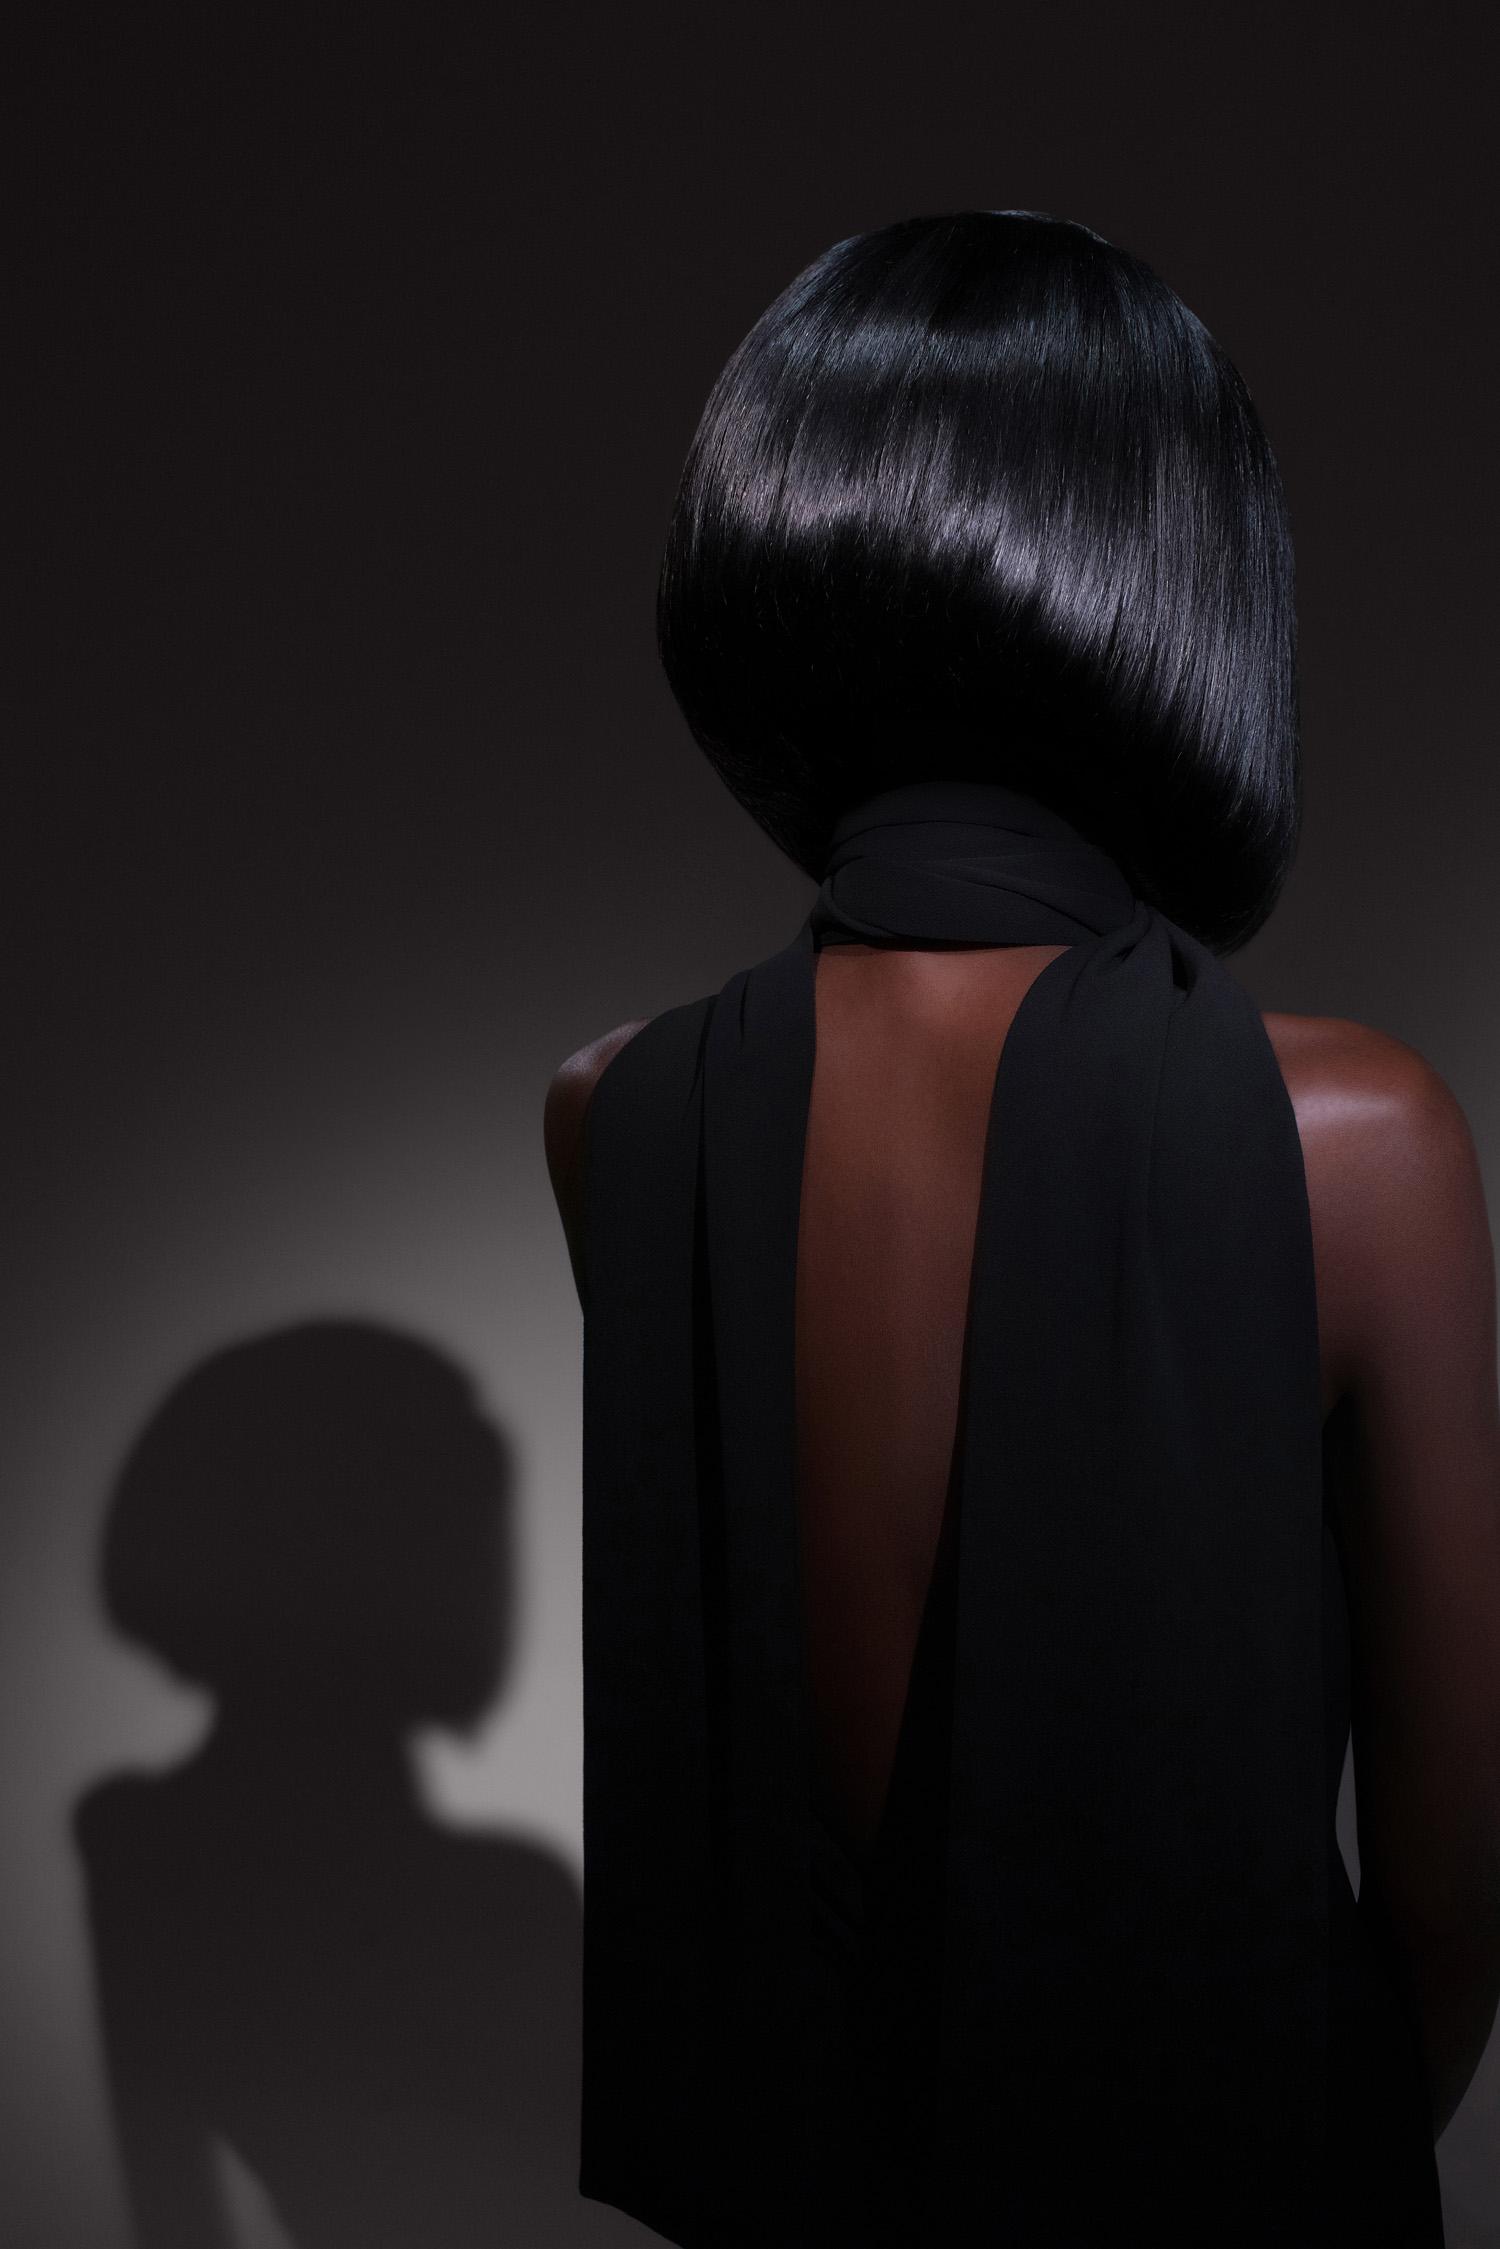 Beatnik Luxury Full Lace Black Wig- 360 Frontal Lace